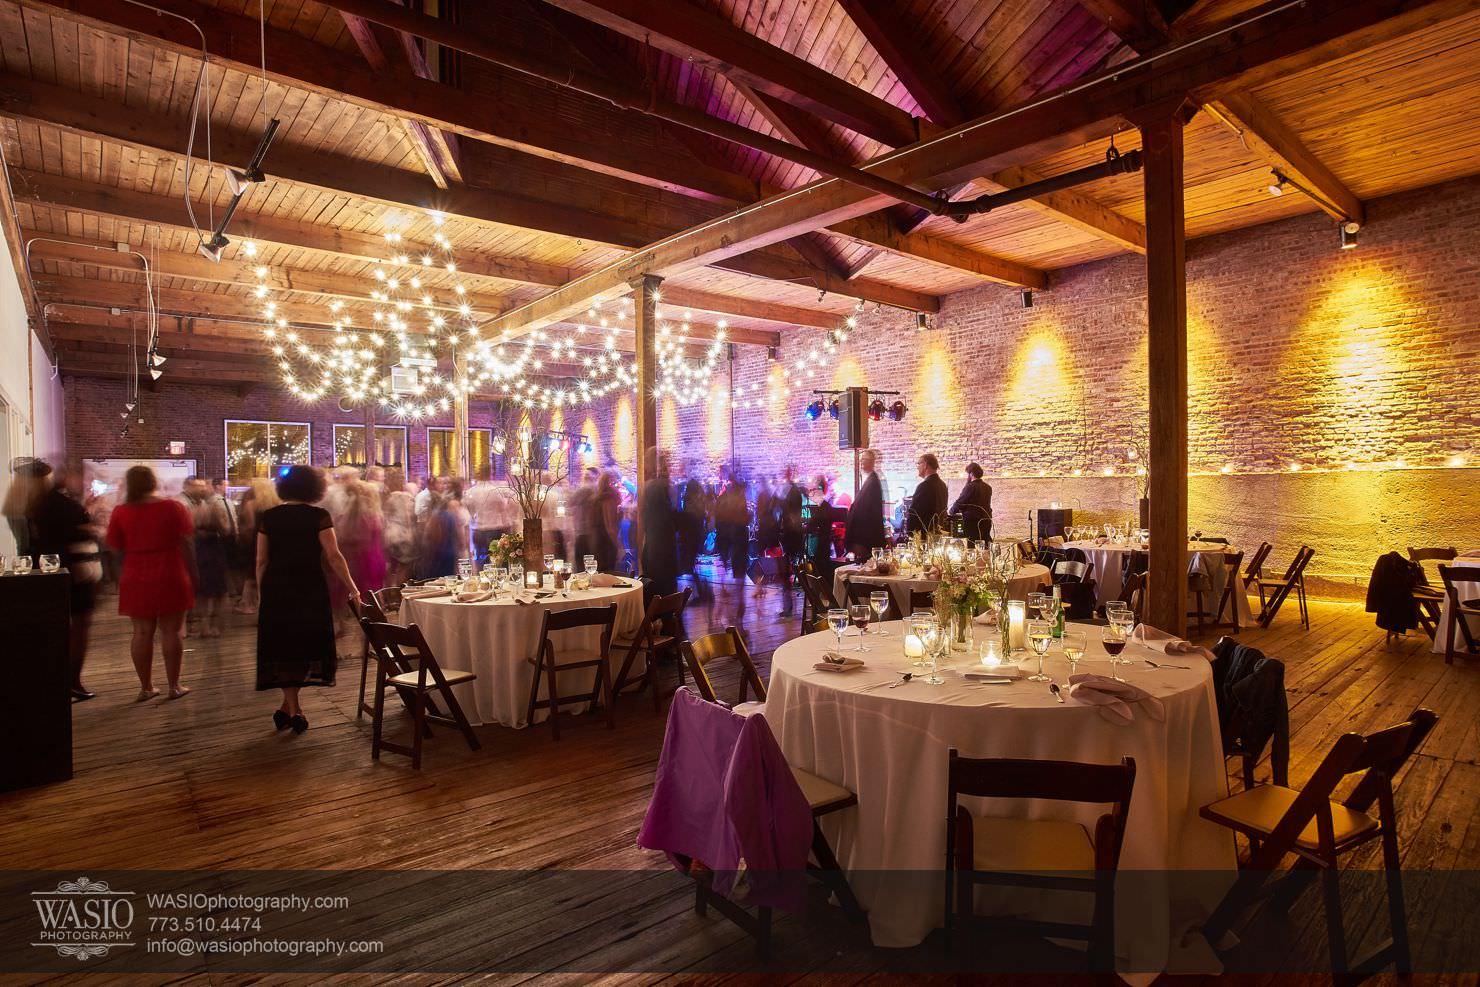 38_Chicago-Gallery-Wedding_DSC08586 Chicago Gallery Wedding - Courtney + Danny